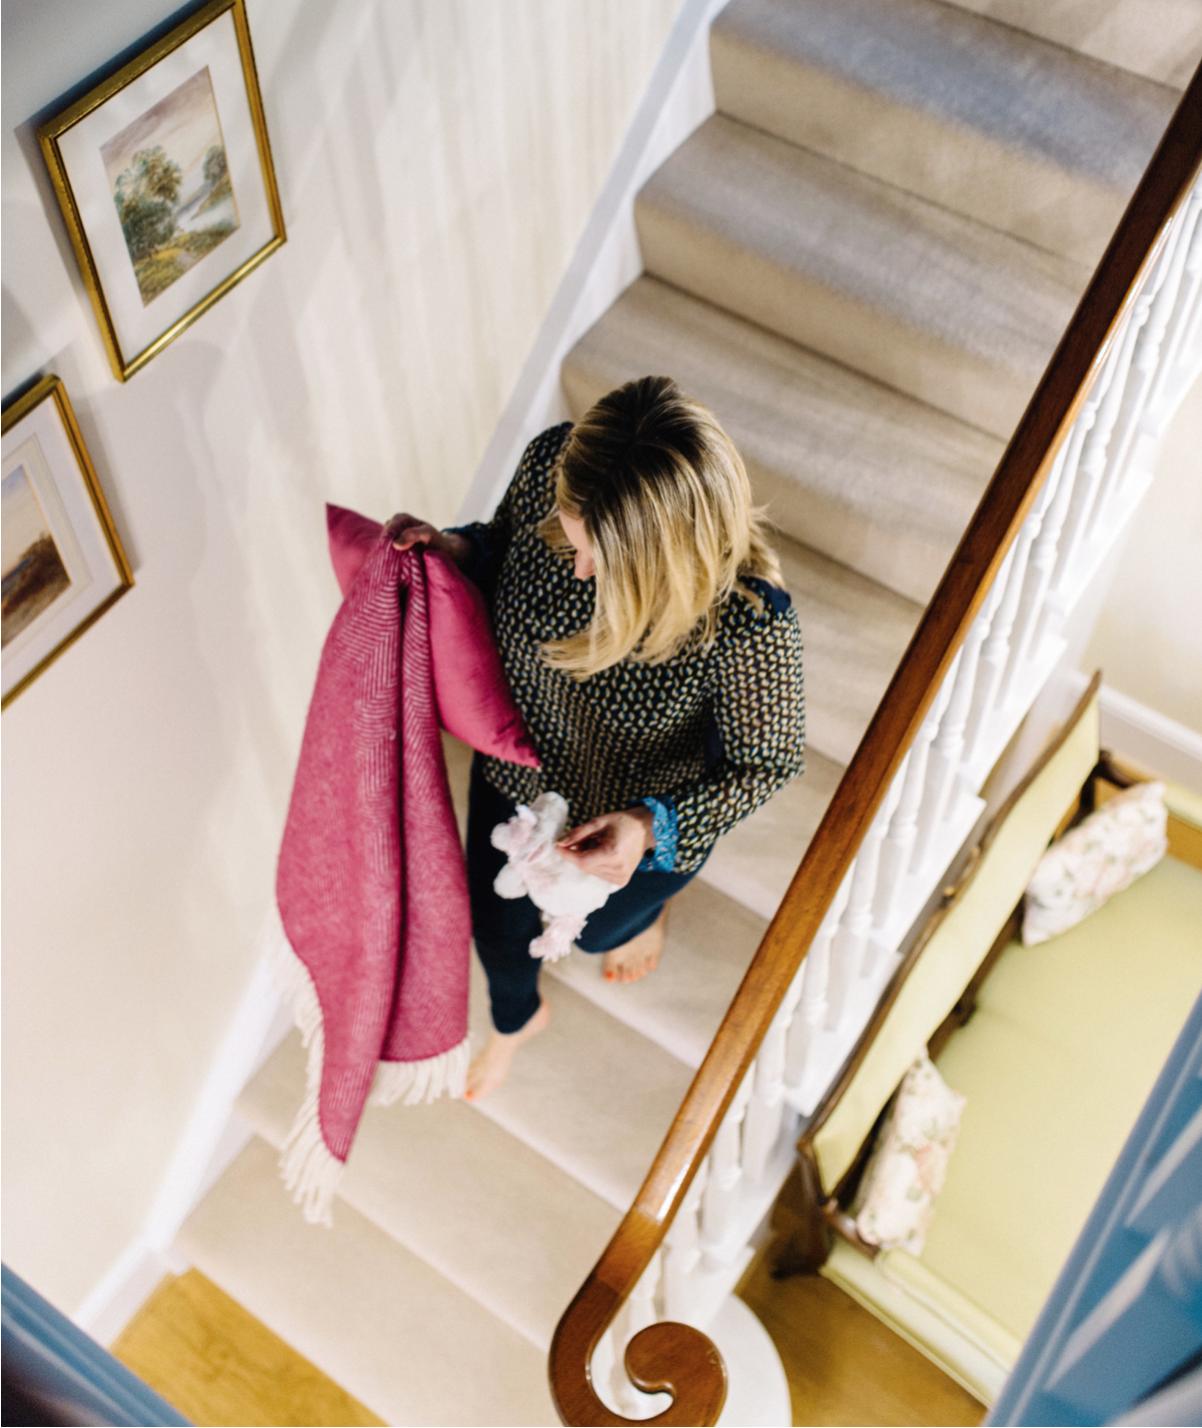 Can your home design actually make you happier?